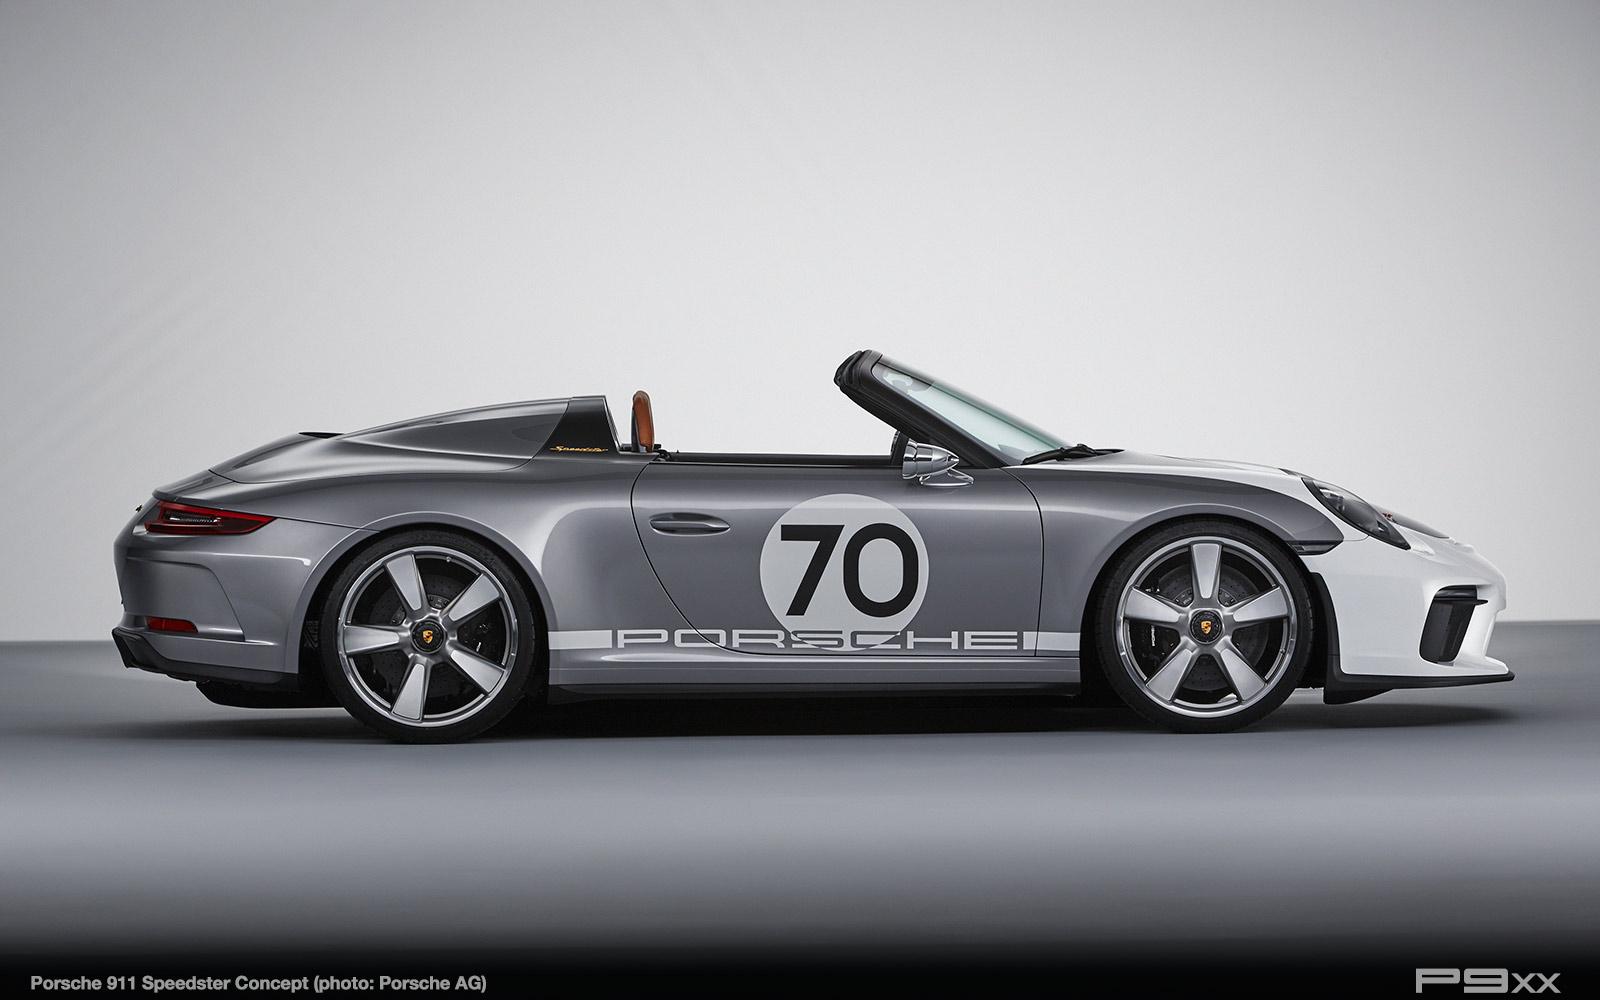 Porsche-911-Speedster-Concept-2018-306